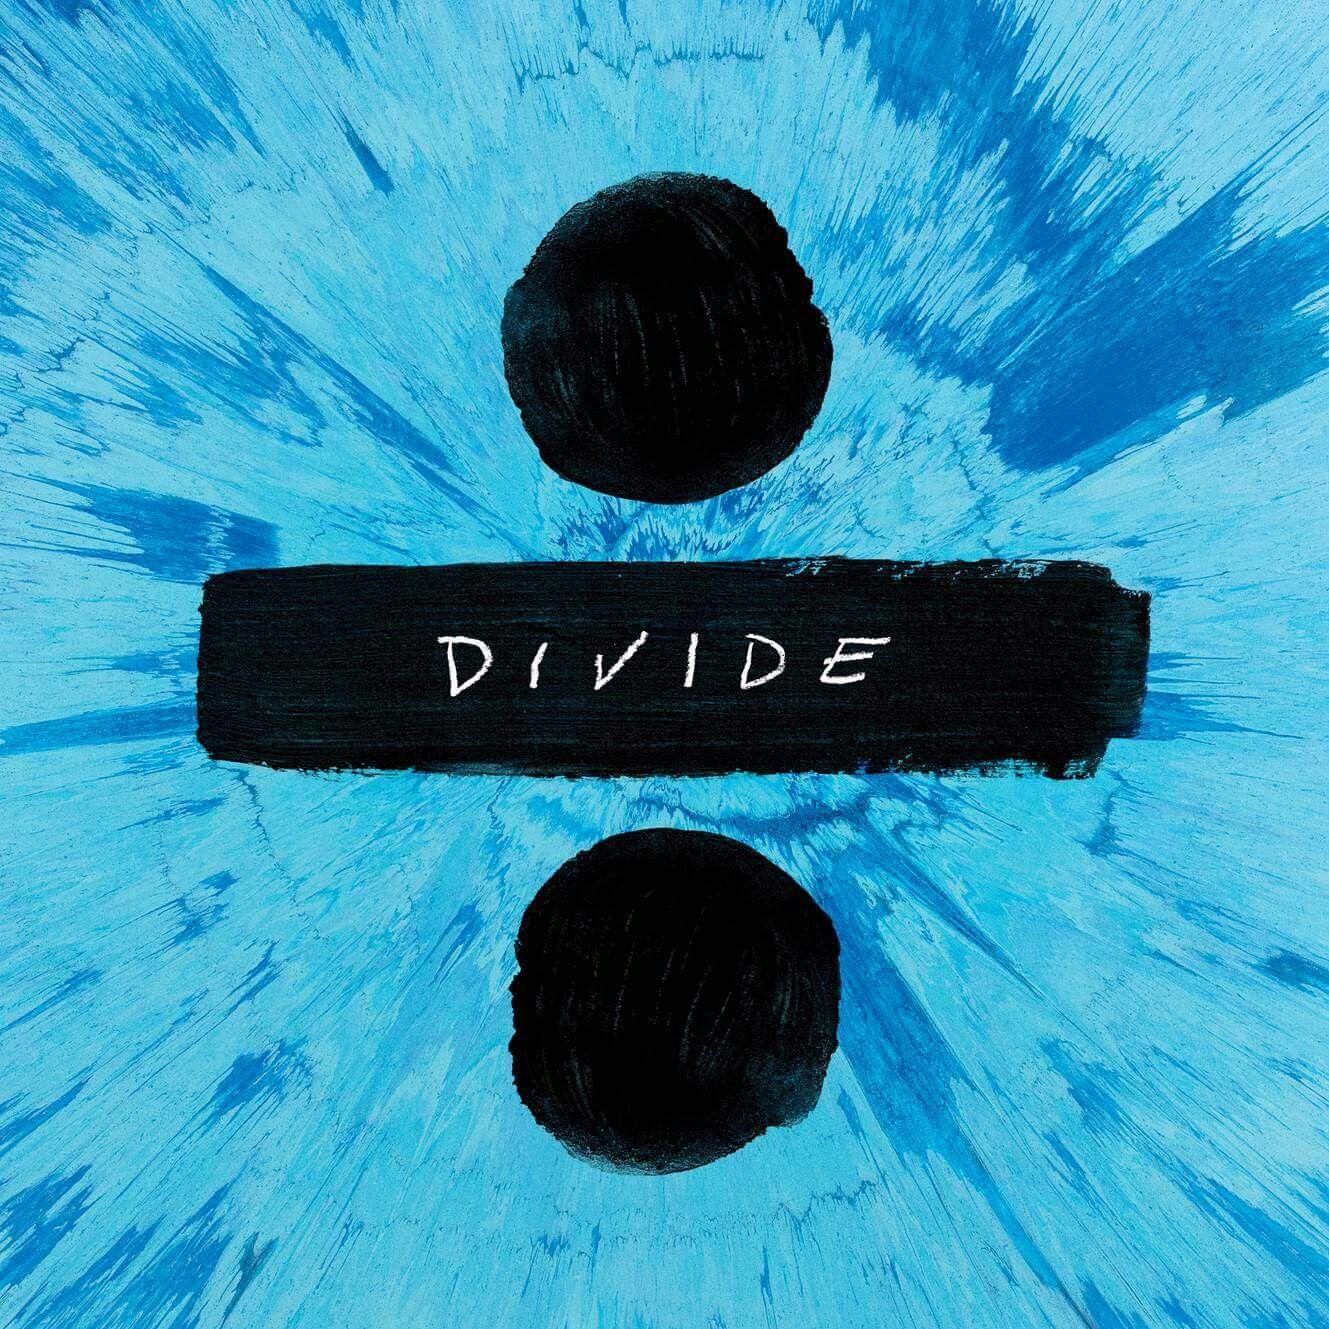 So Worth The Nearly 3 Years That I Waited So Good Ed Sheeran Has Done It Again Music Cd Album Music Albums Ed Sheeran